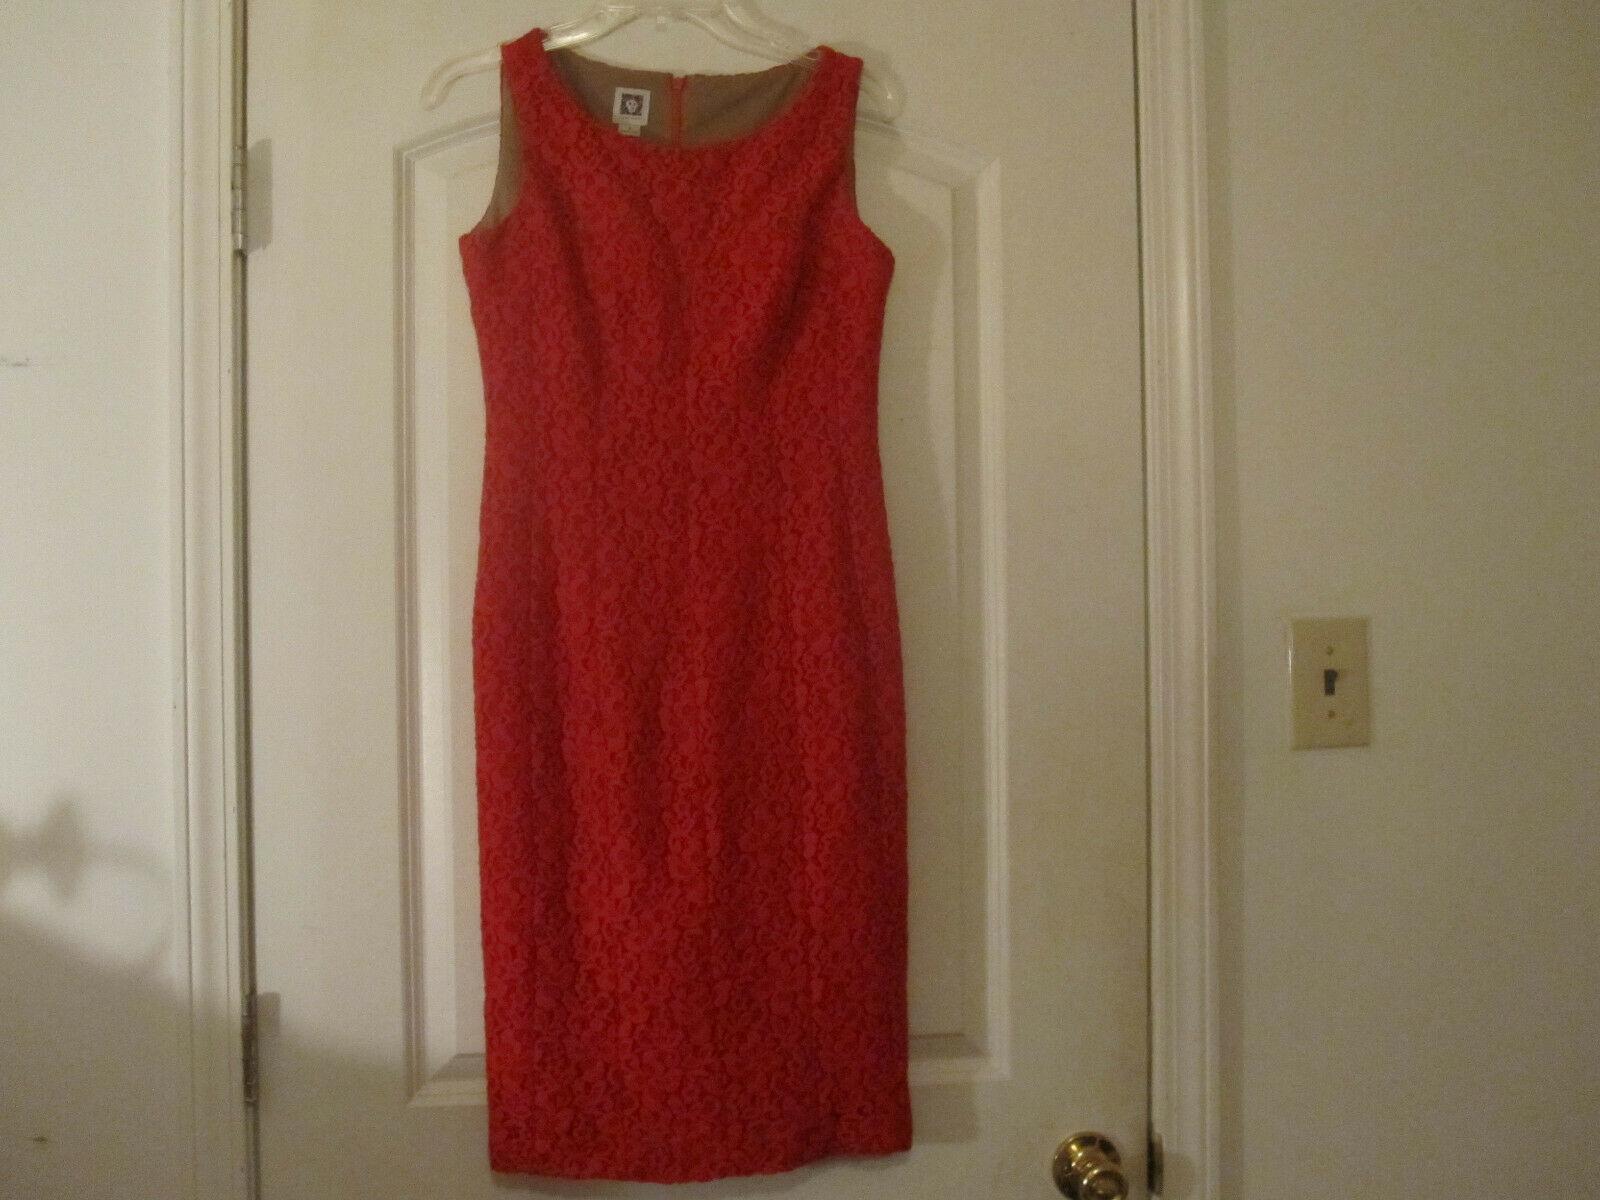 Anne Klein Womens Red Crochet Dress Lined Sleeveless Size 2